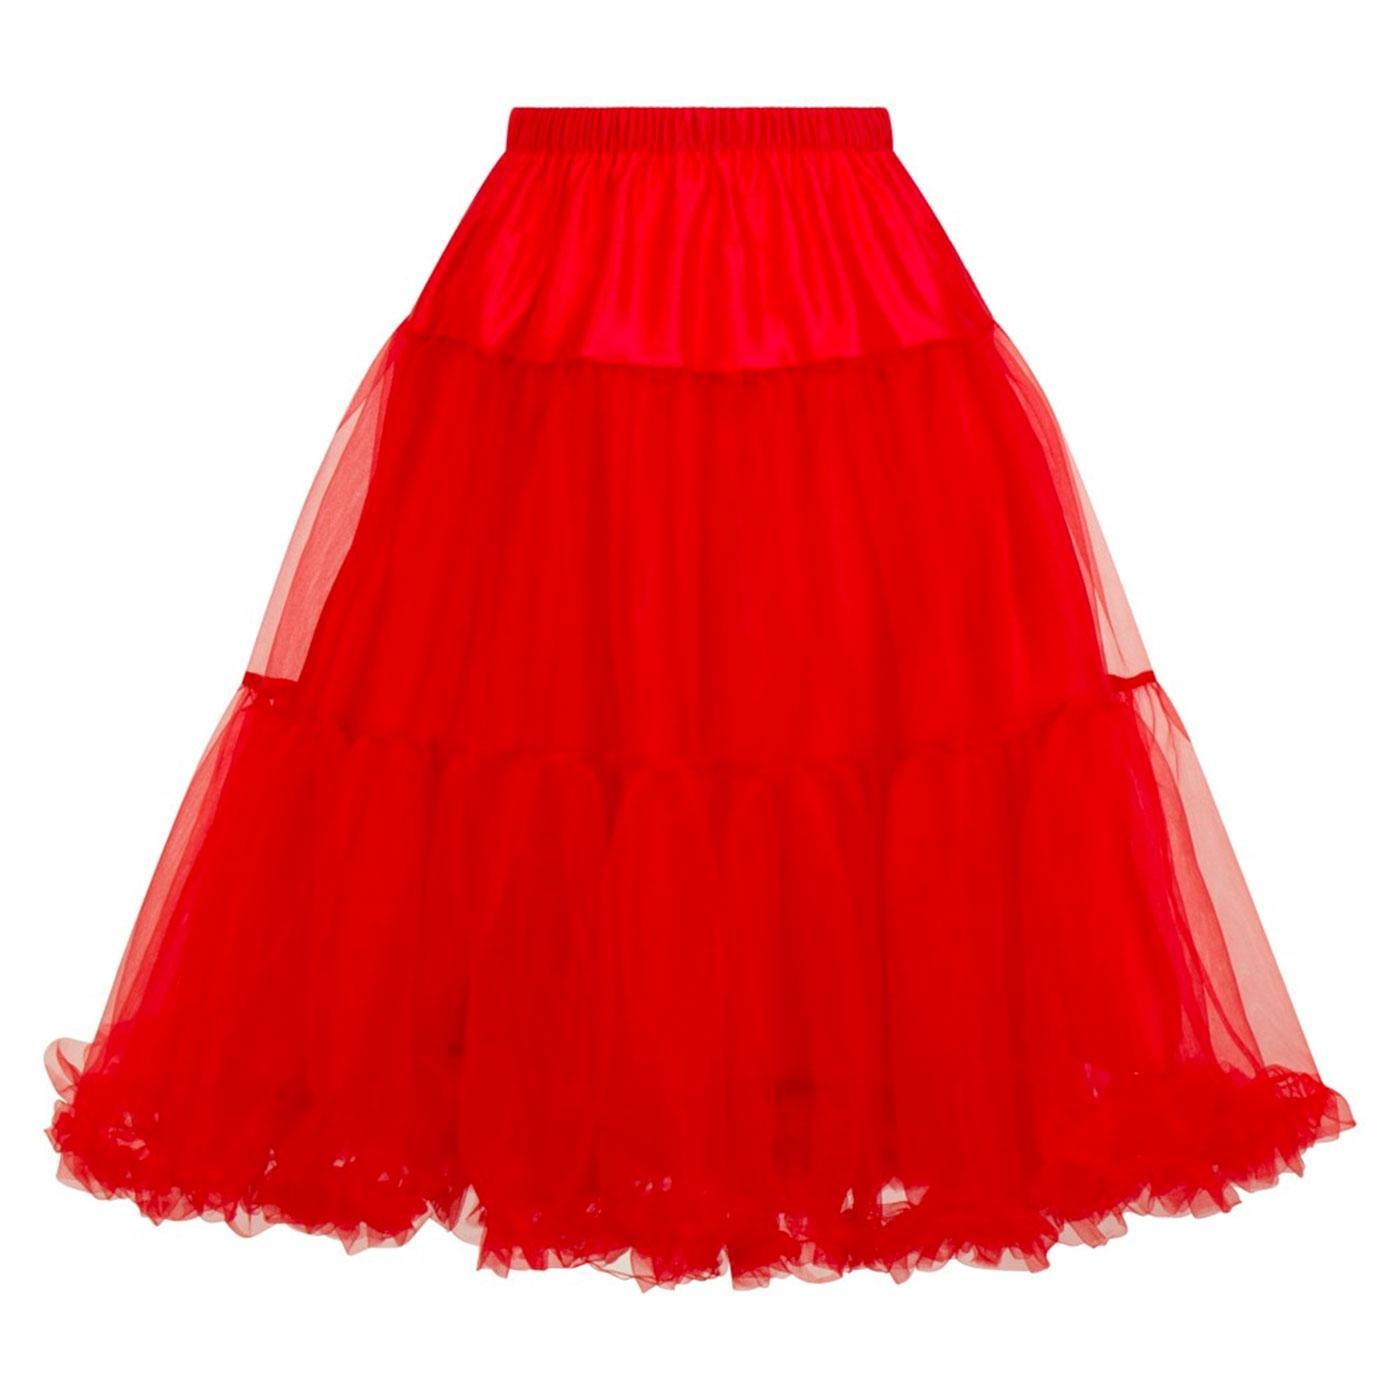 Polly HELL BUNNY Retro 50s Crinoline Petticoat R